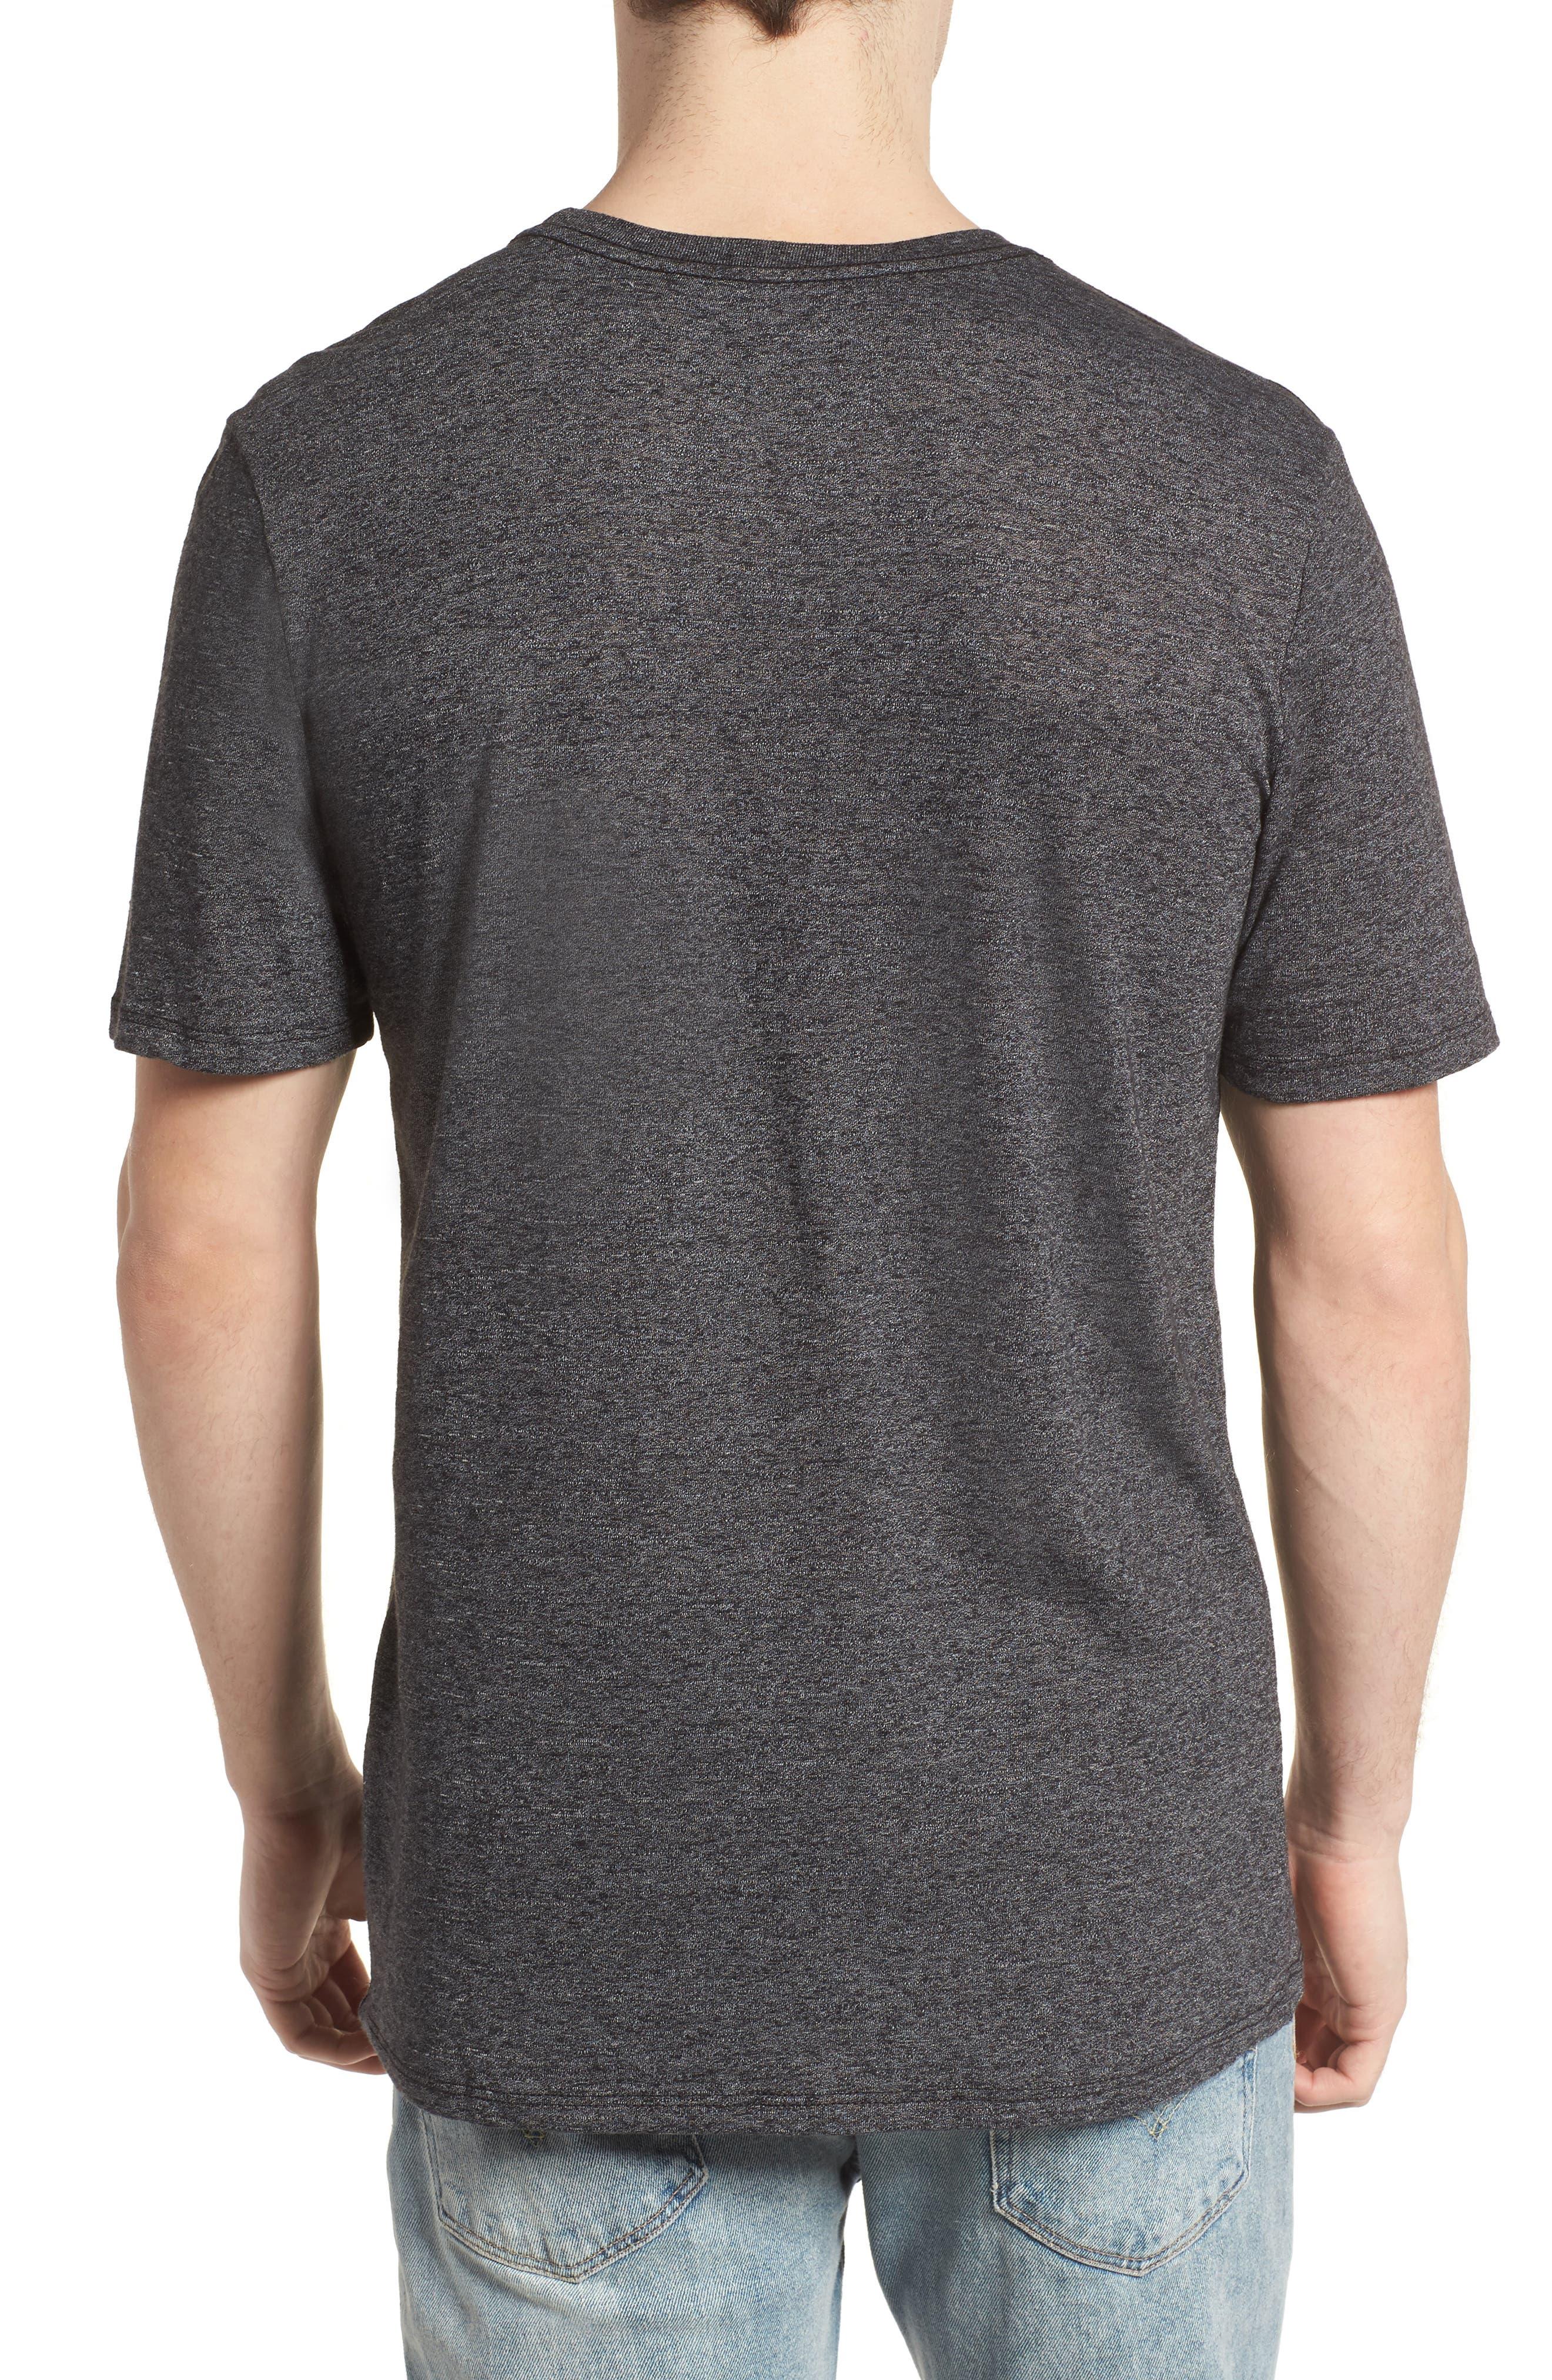 Swellagon Triblend T-Shirt,                             Alternate thumbnail 2, color,                             Black / Wolf Grey